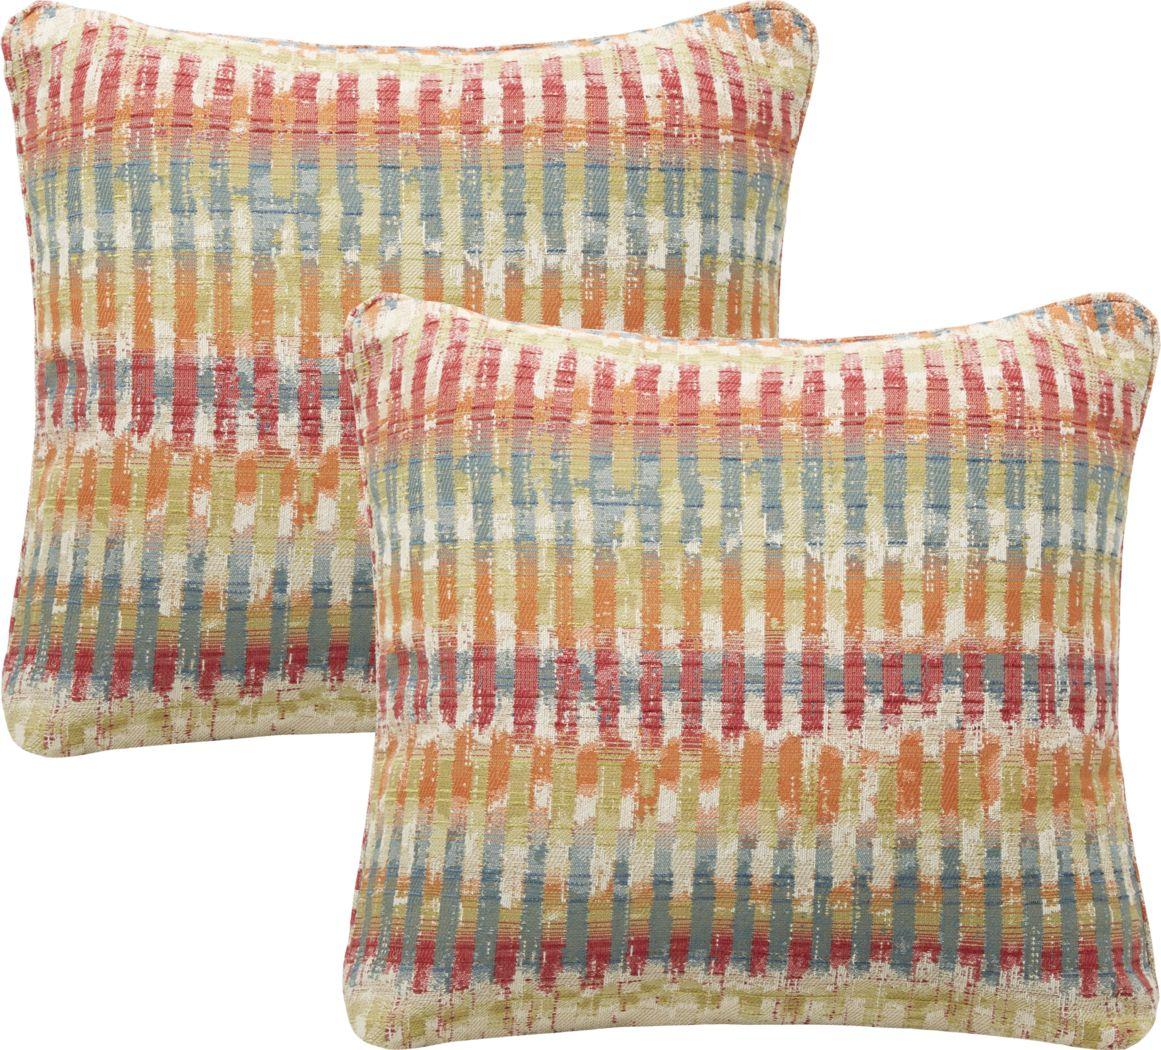 iSofa Handcraft Multi Accent Pillows (Set of 2)